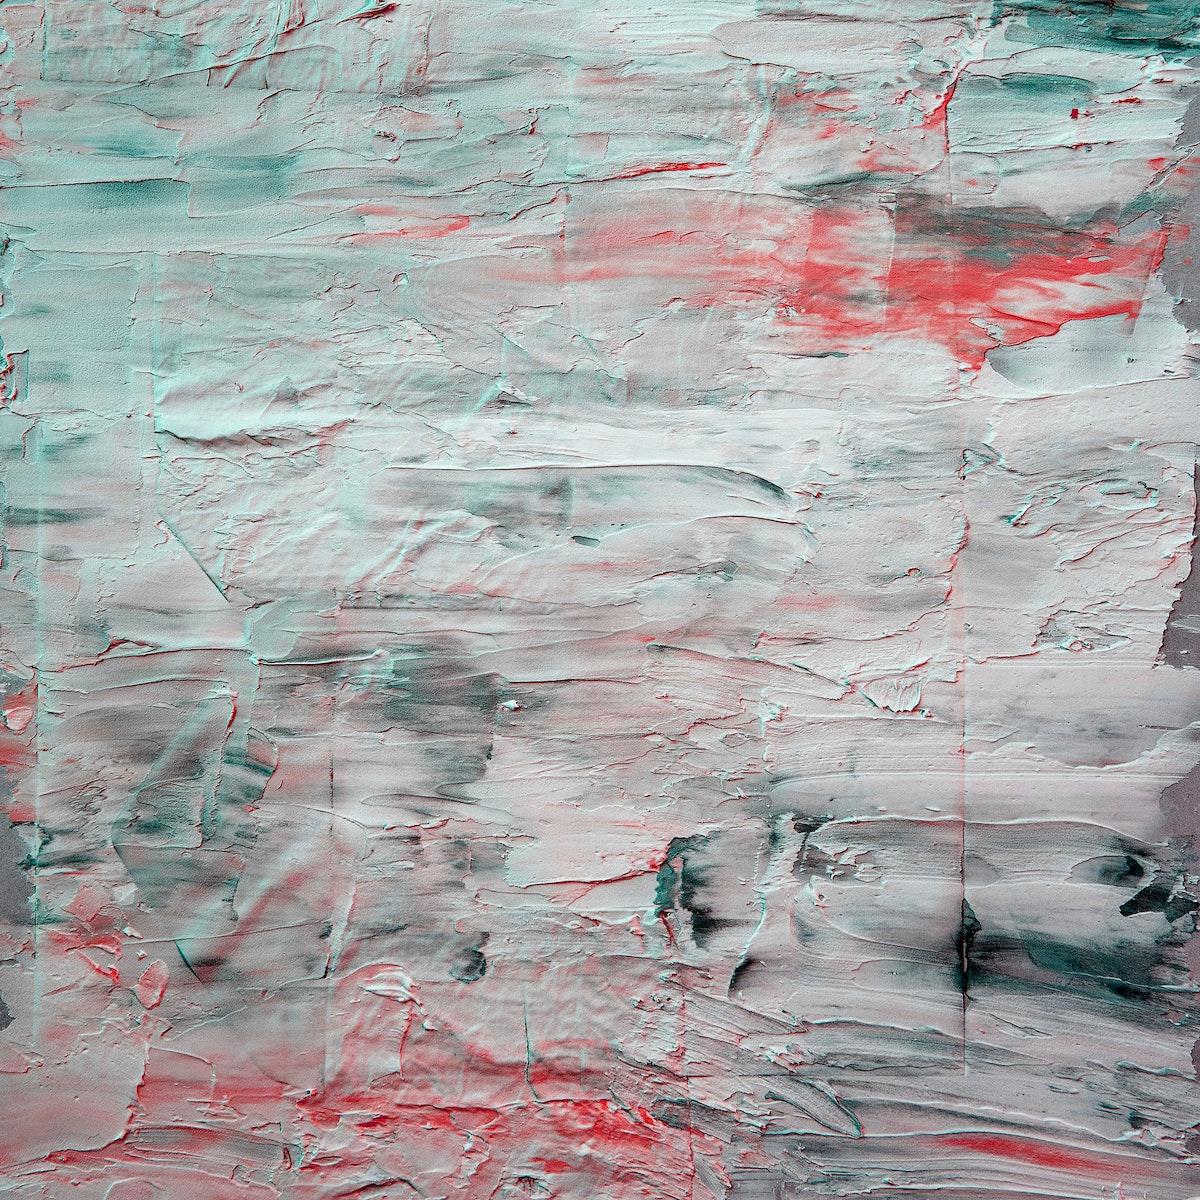 Oil paintbrush stroke texture background